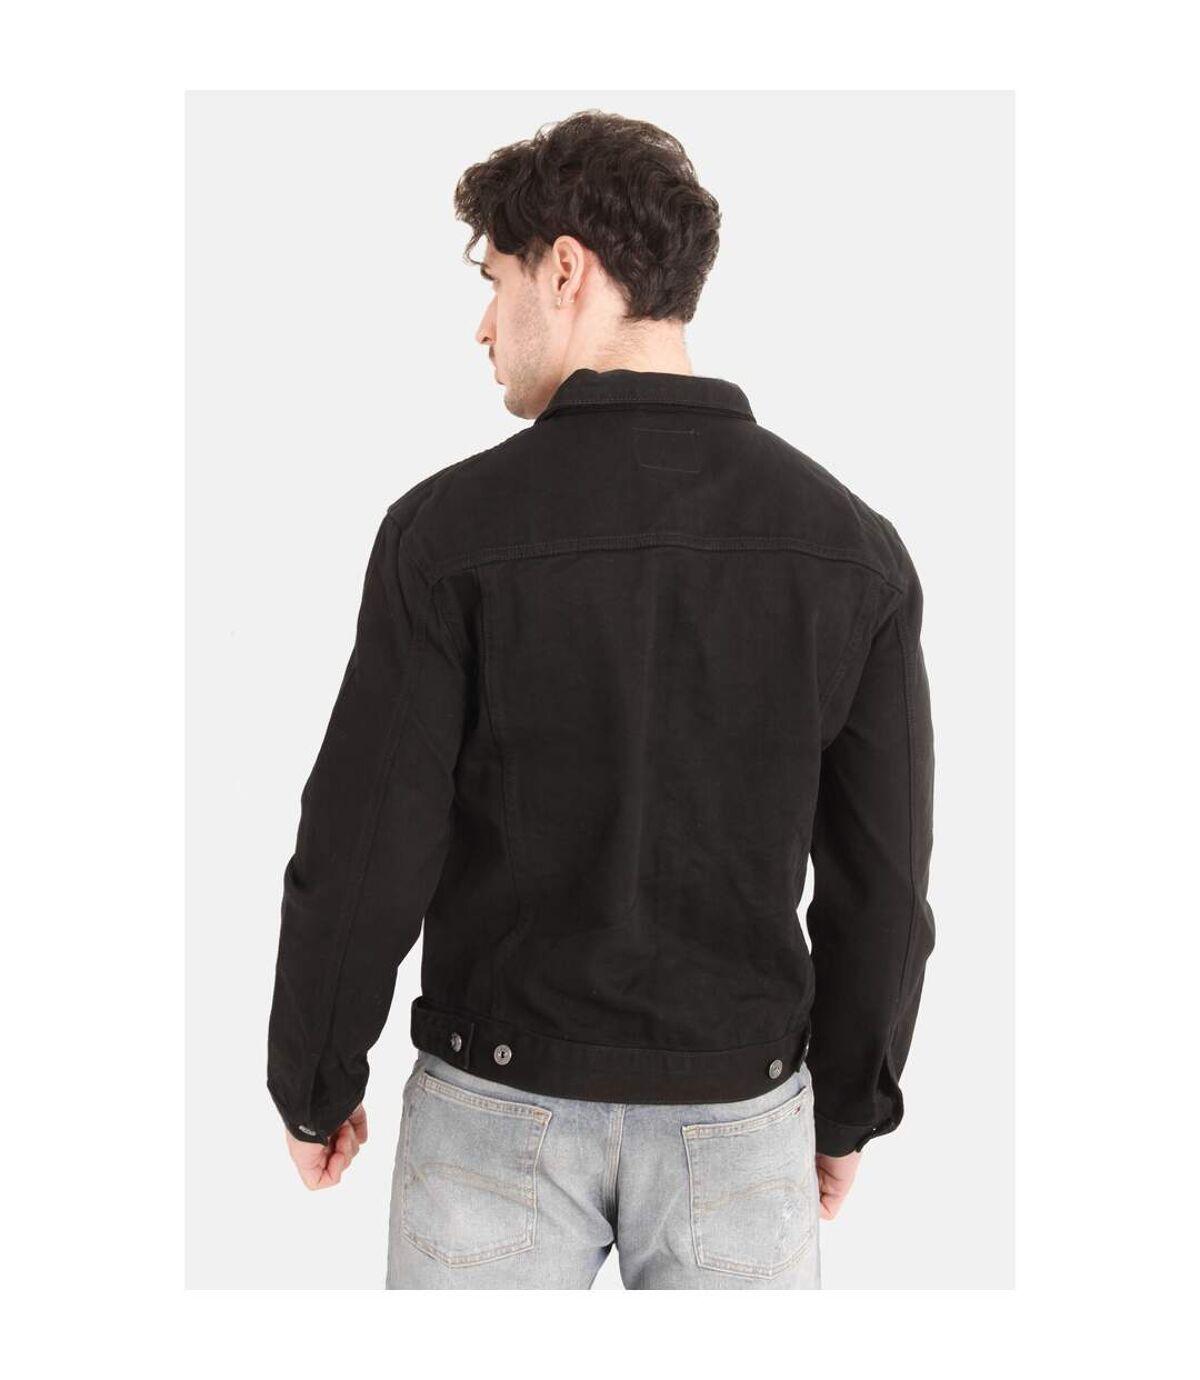 Duke Mens Kingsize Western Trucker Style Denim Jacket (Stonewash) - UTDC127